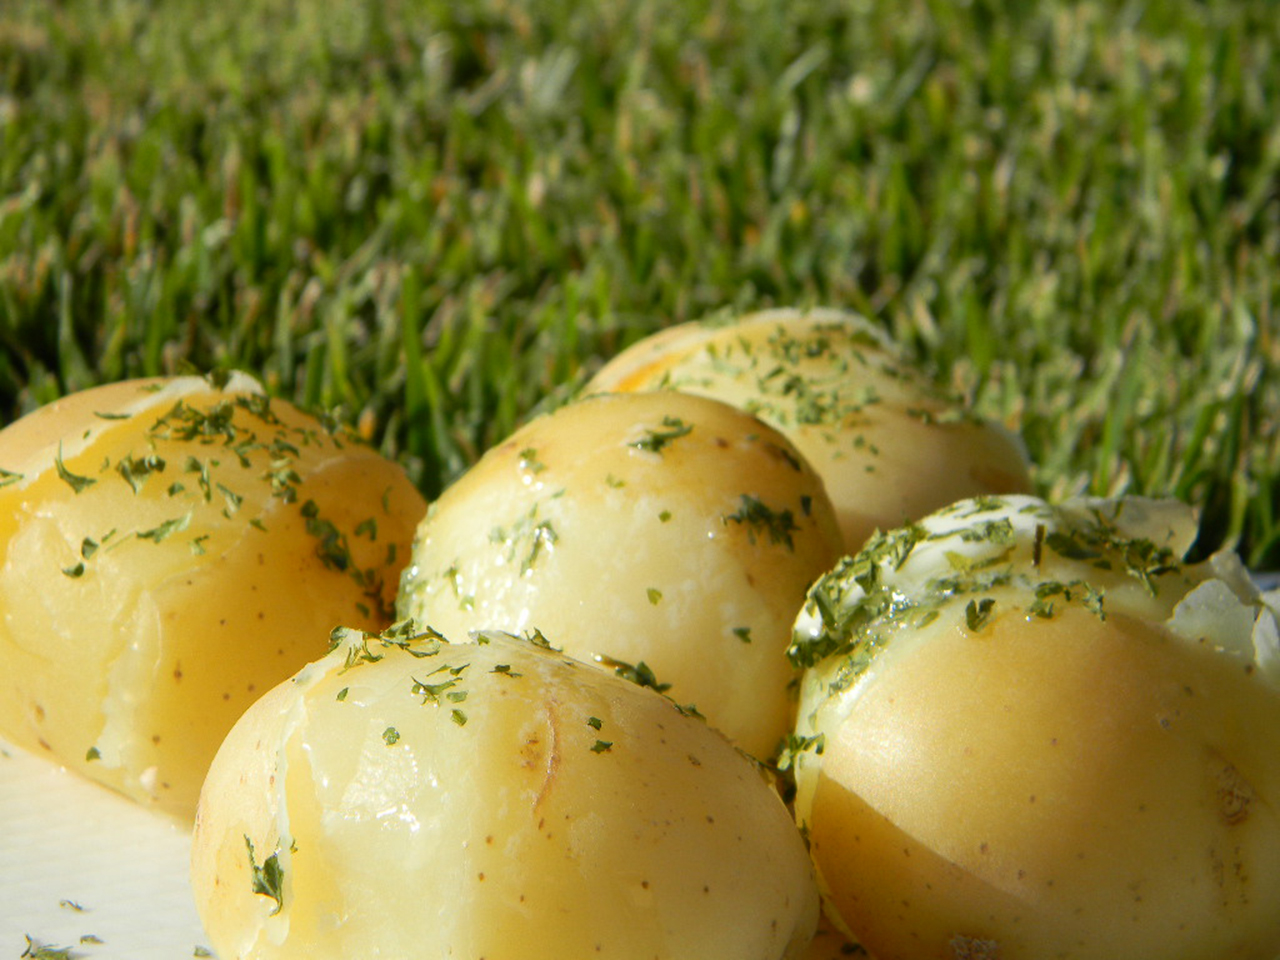 Lengenberg S Boiled Potatoes Recipe Allrecipes